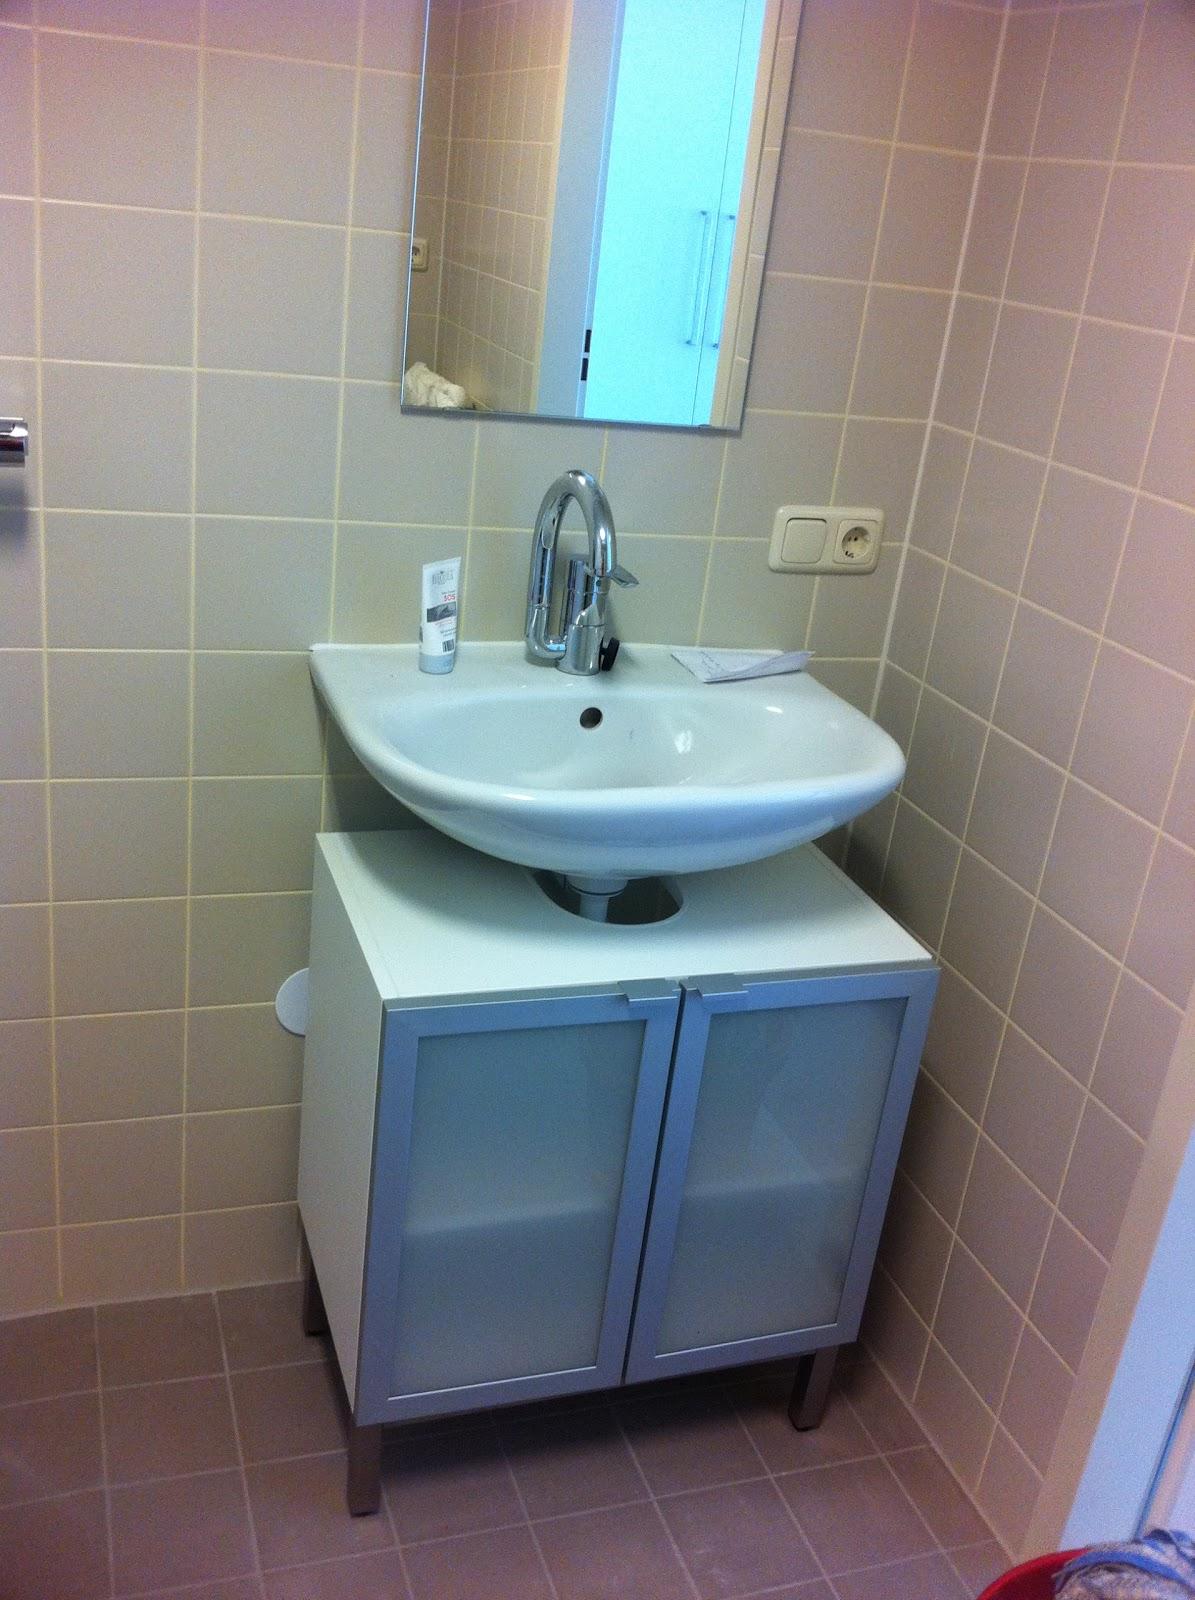 JAN&TINE IN KORTENHOEF: Kastje onder wastafel badkamer